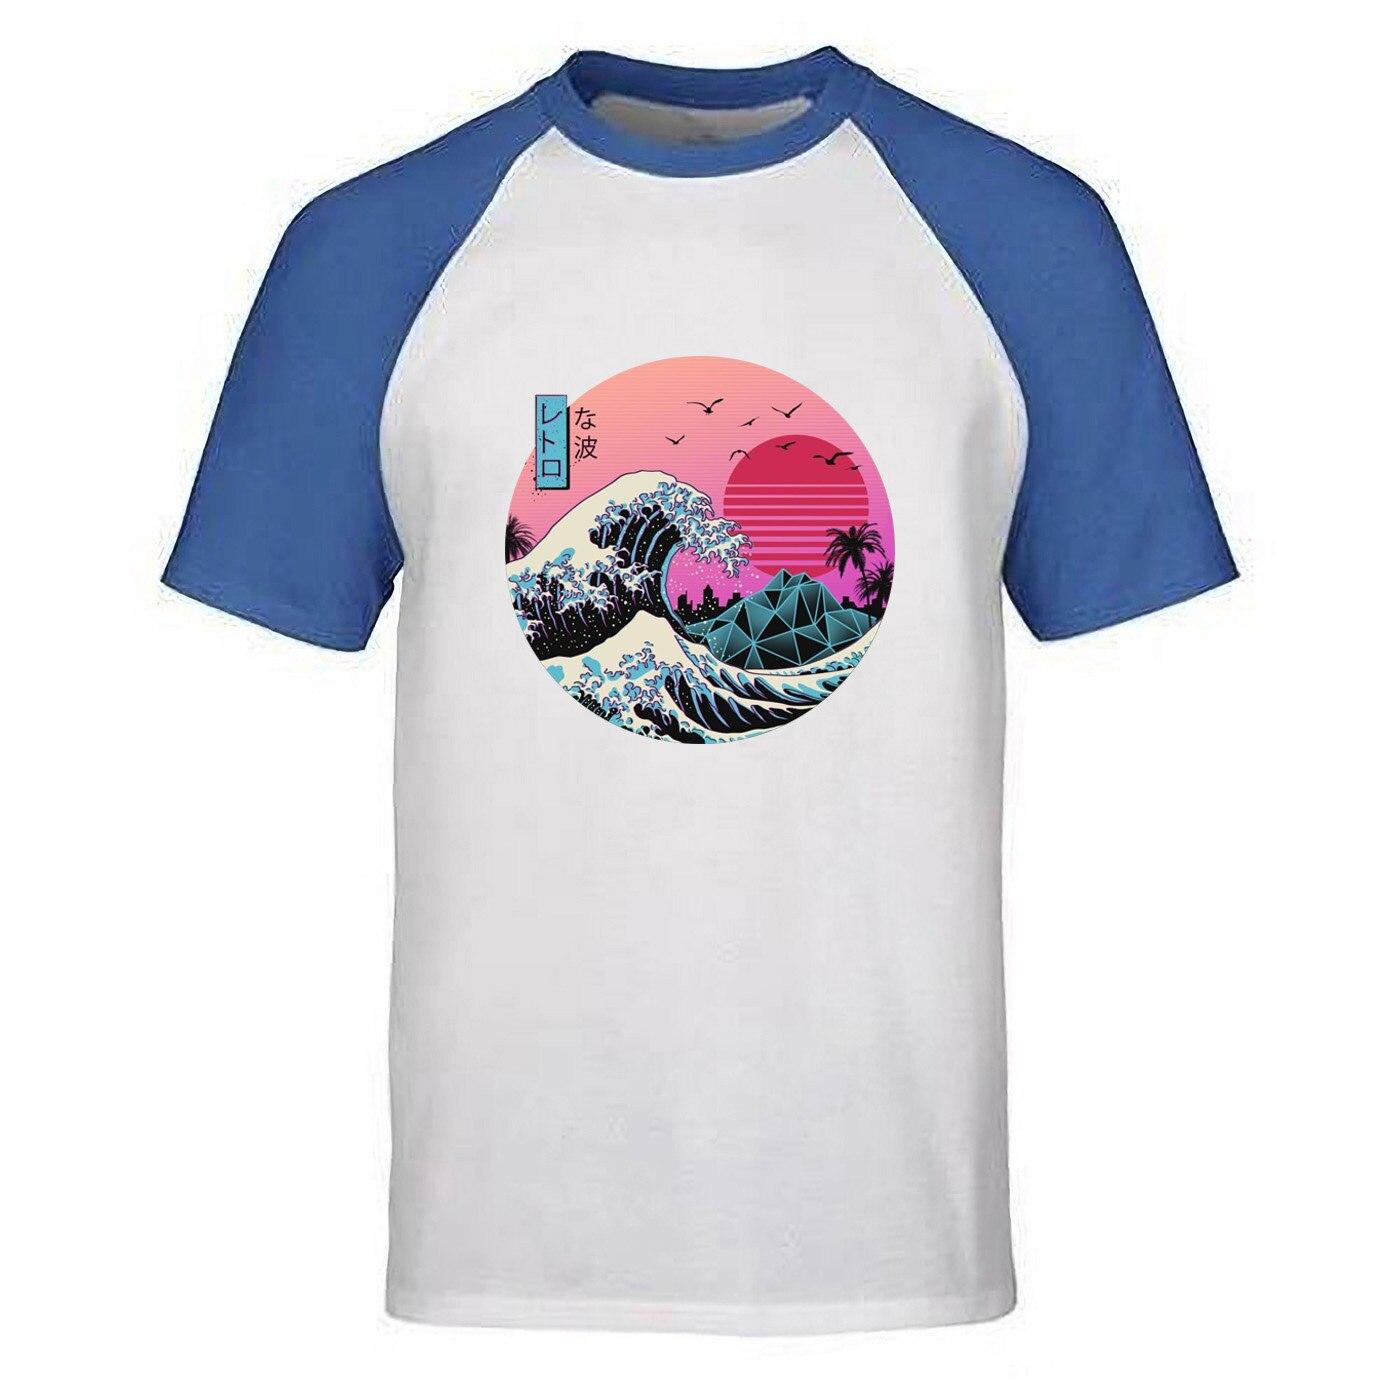 Tshirt Men The Great Retro Wave Japan Anime Vaporwave T Shirt Tshirts Summer Tops Classic Painting Short Sleeve Harajuku Tee